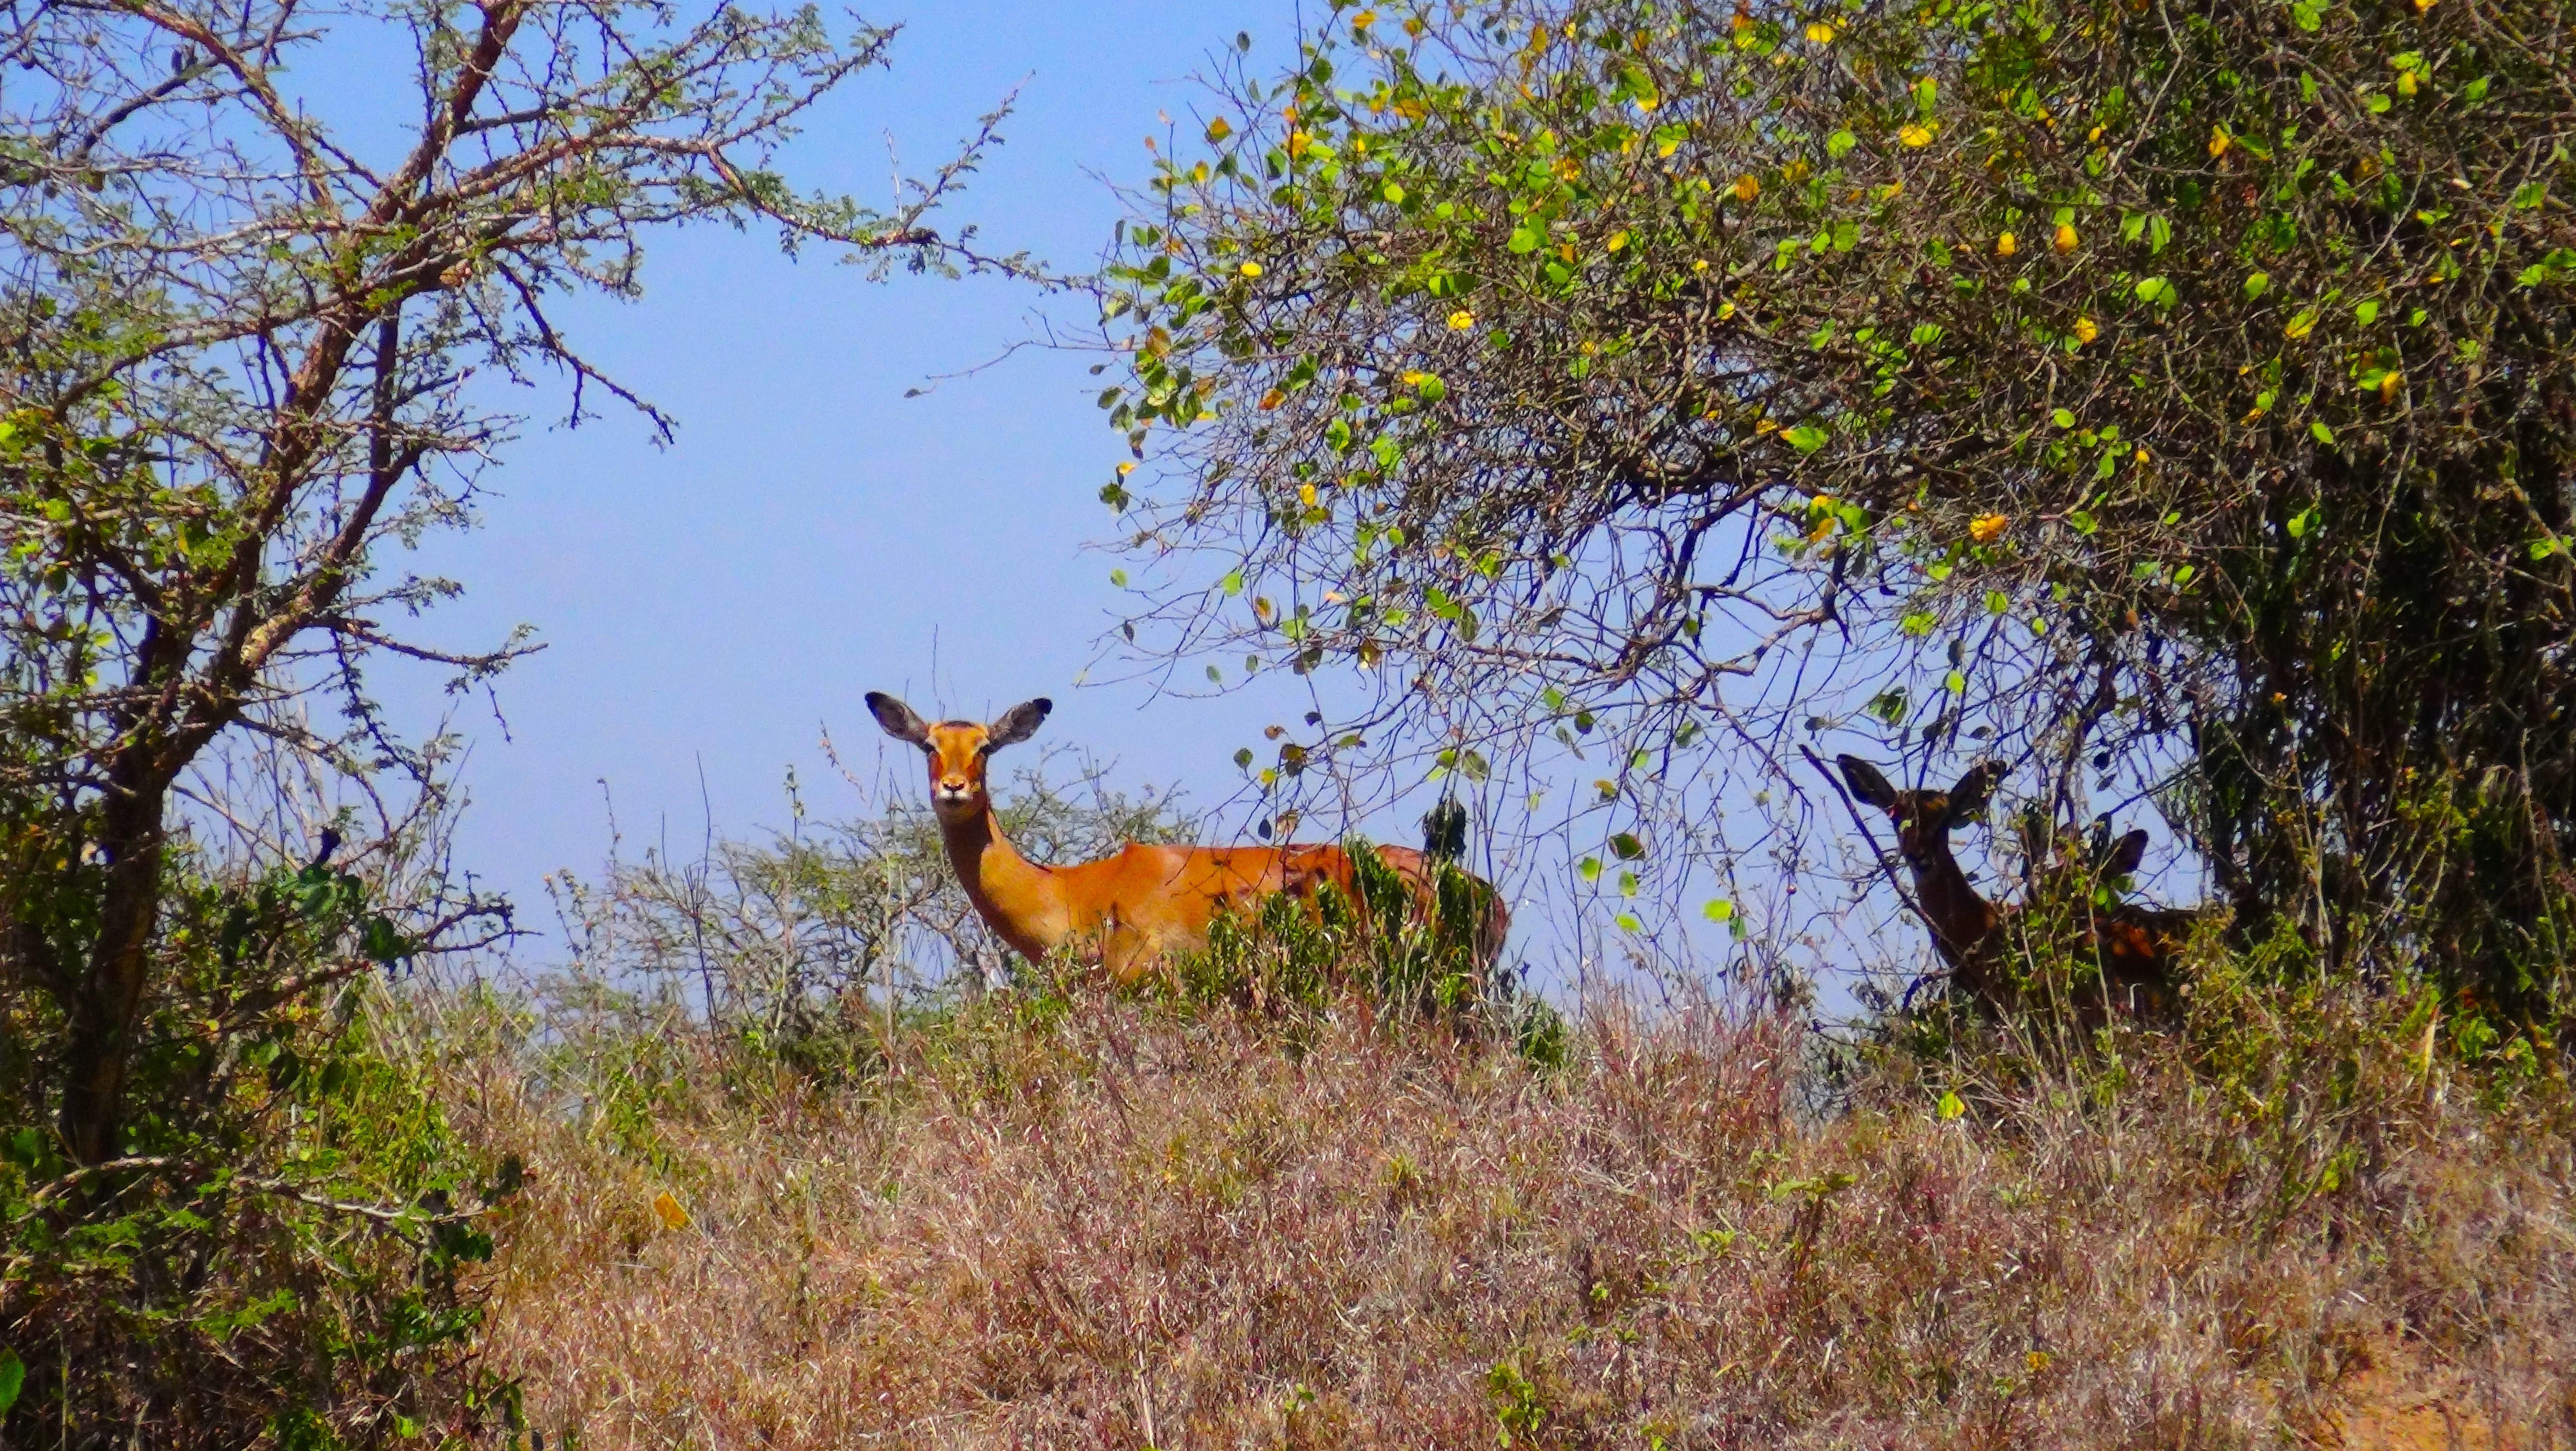 Un impala qui me fixe au loin